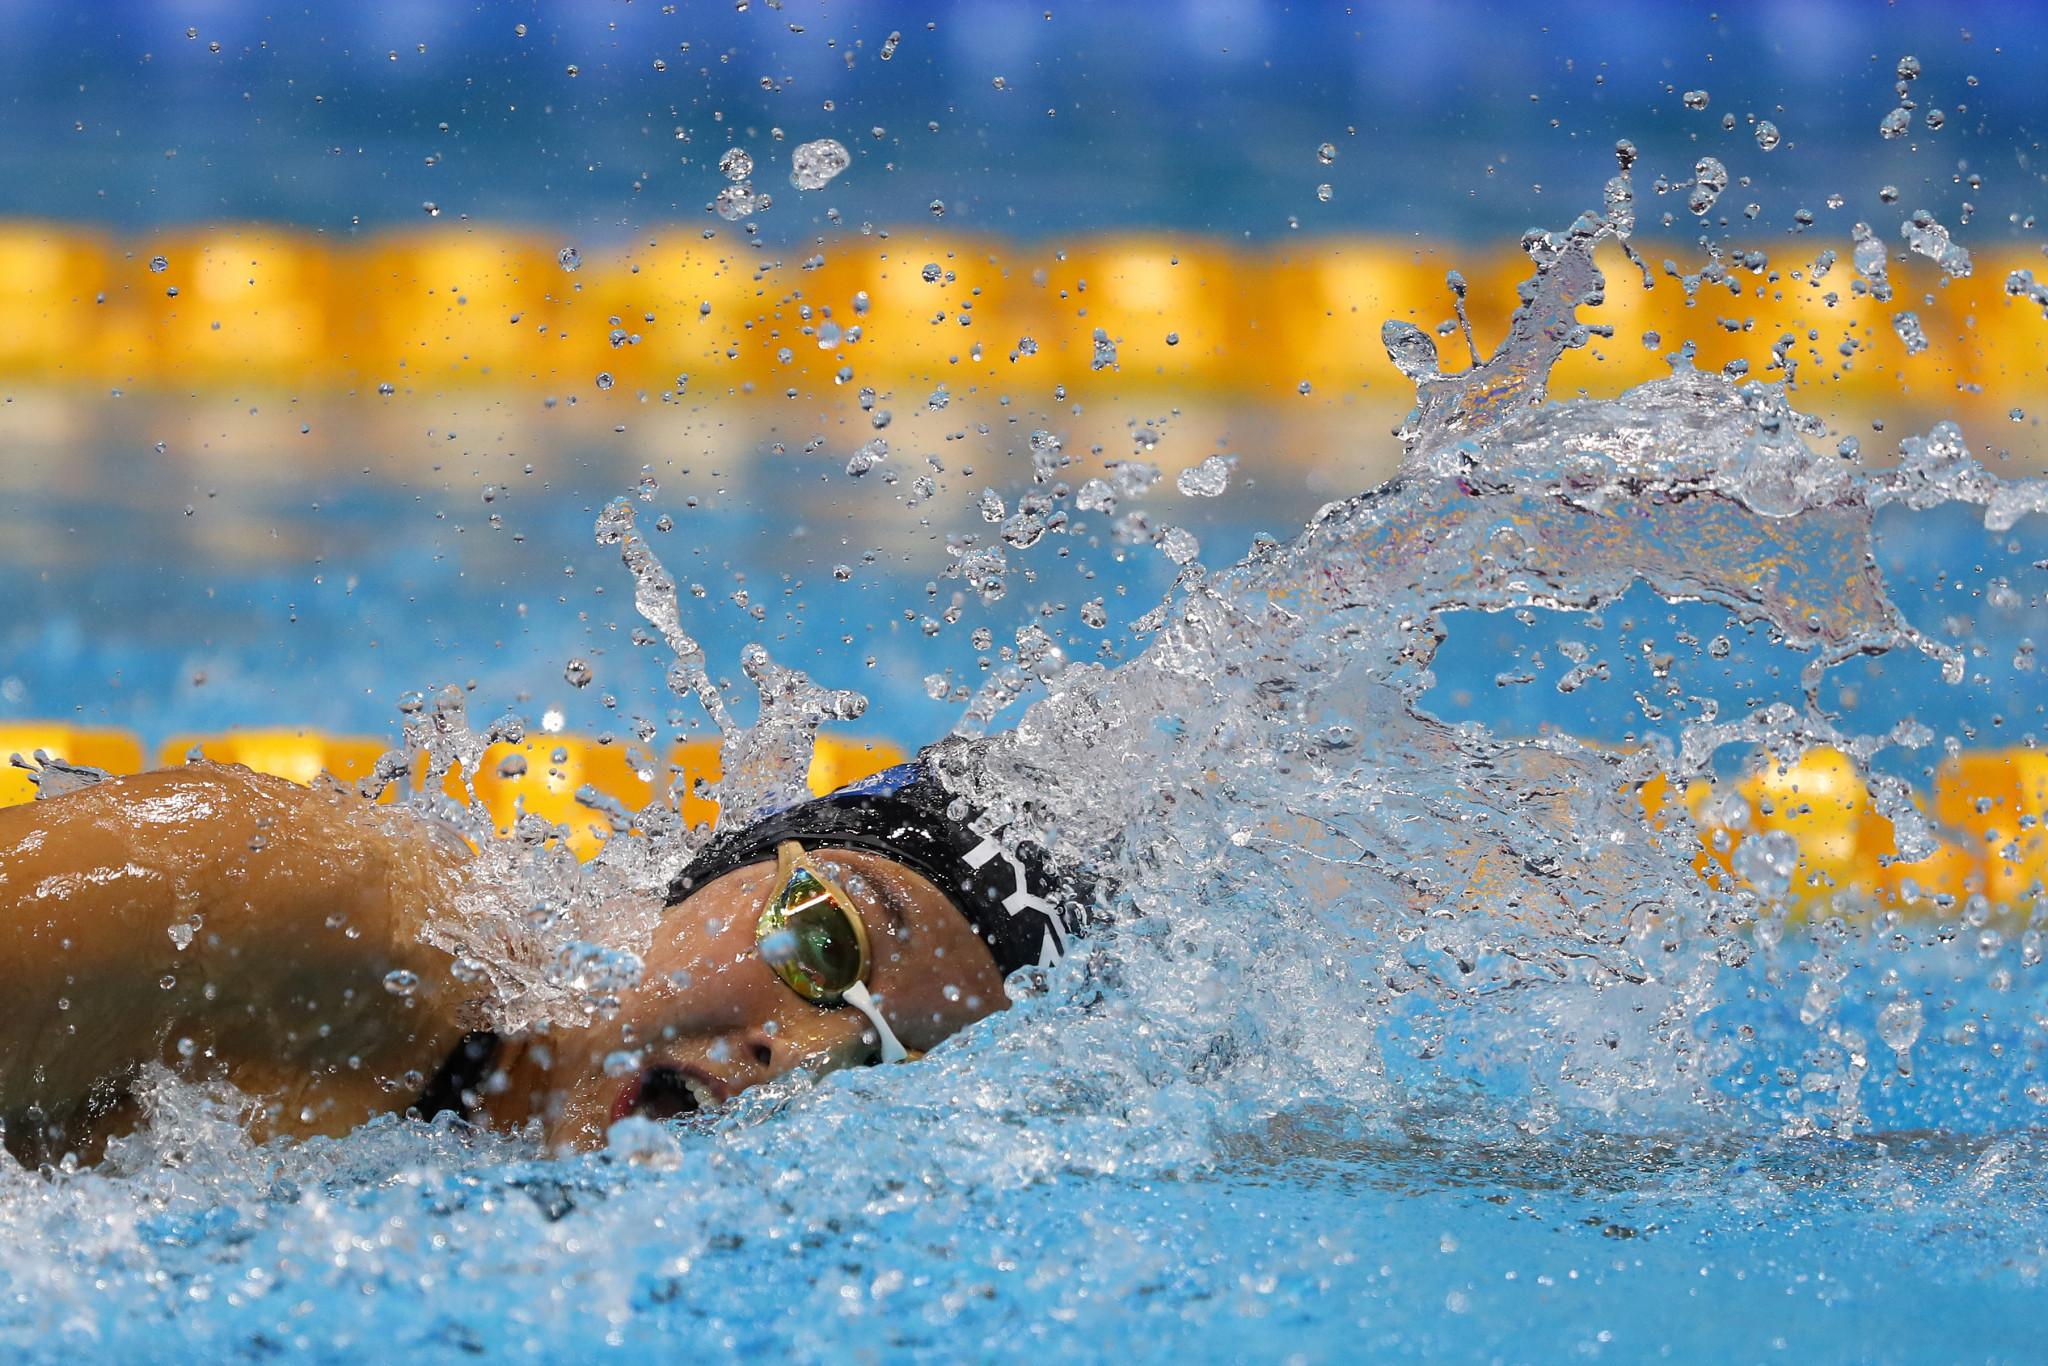 Tai and Barlaam continue record-breaking start to World Para Swimming Championships